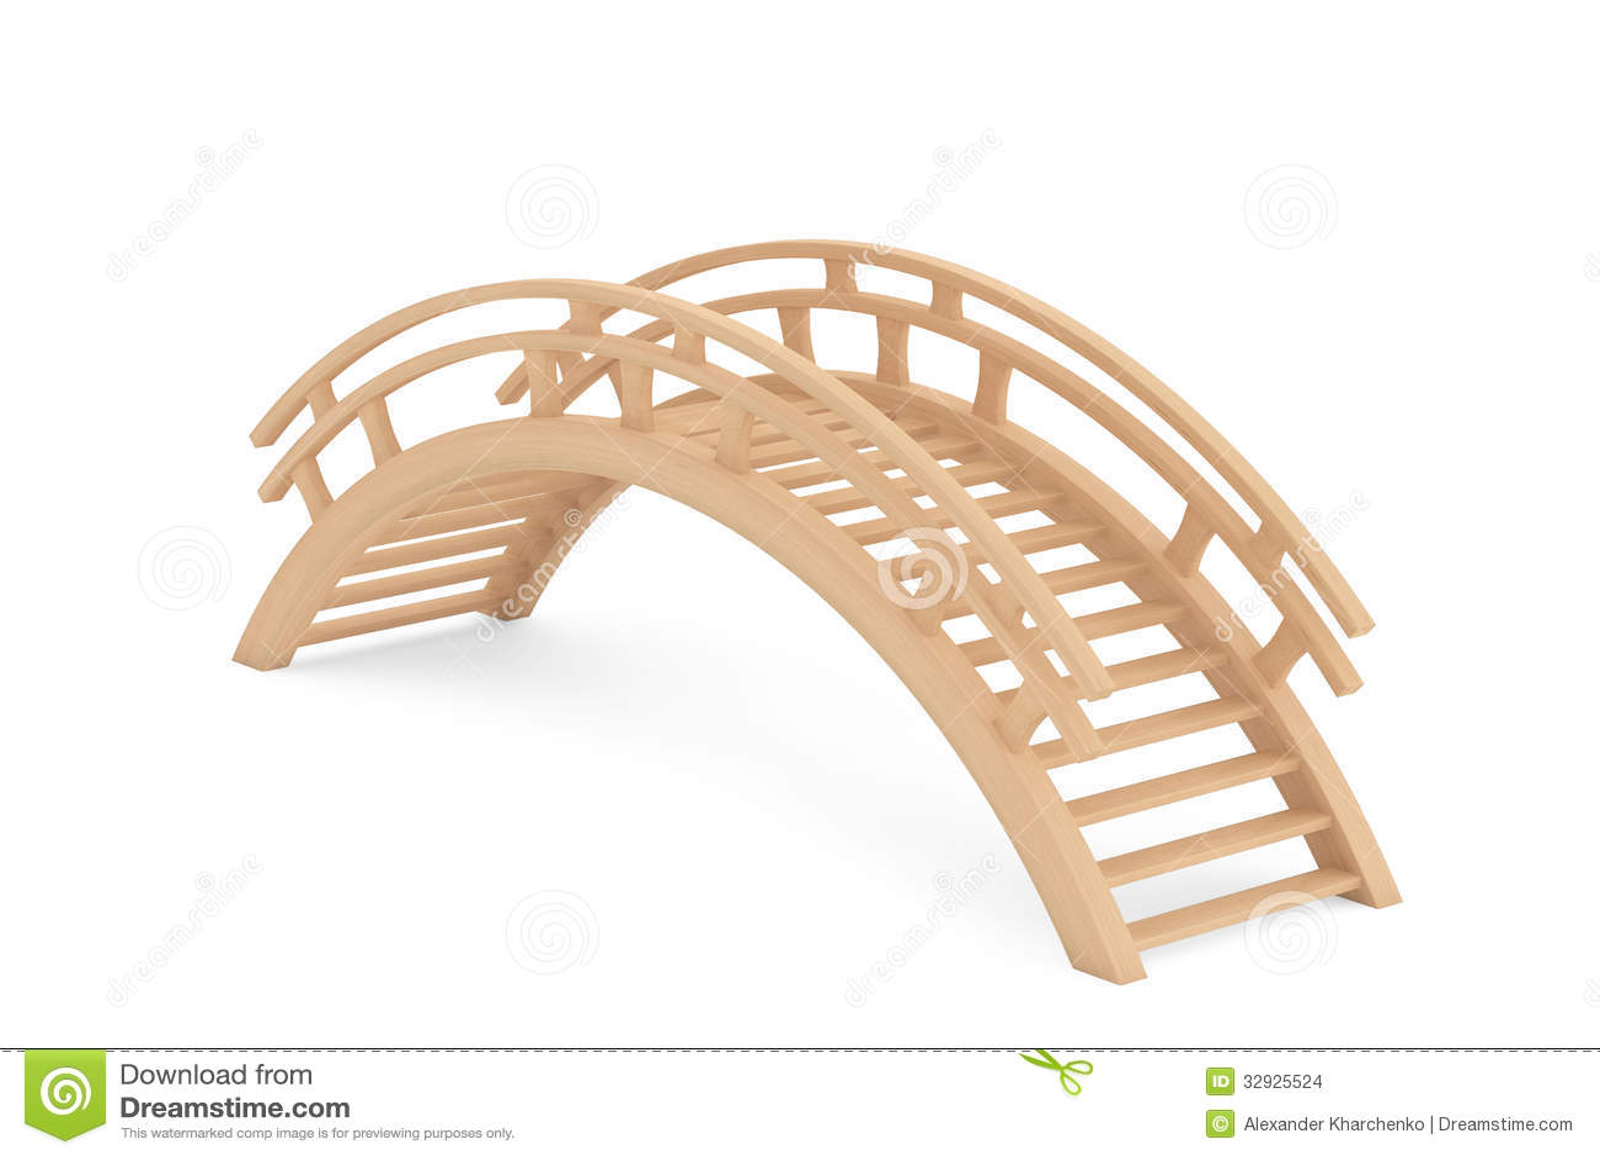 Closeup 3d Wooden Bridge Stock Images - Image: 32925524